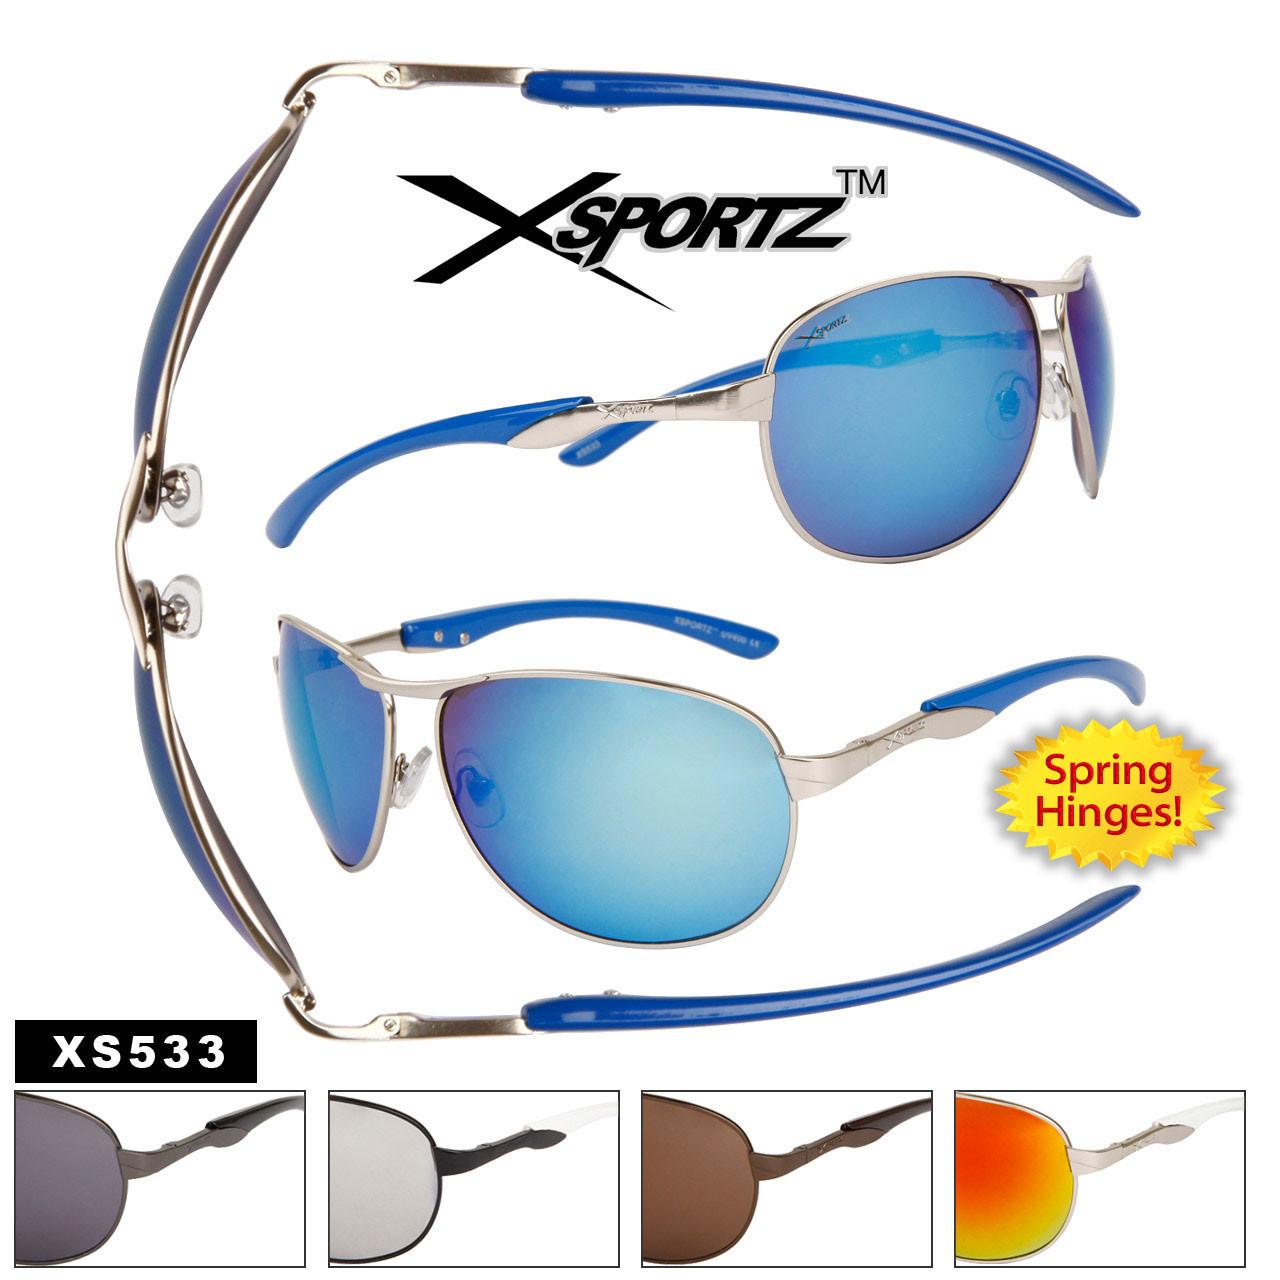 Wholesale Xsportz™ Sunglasses by the Dozen